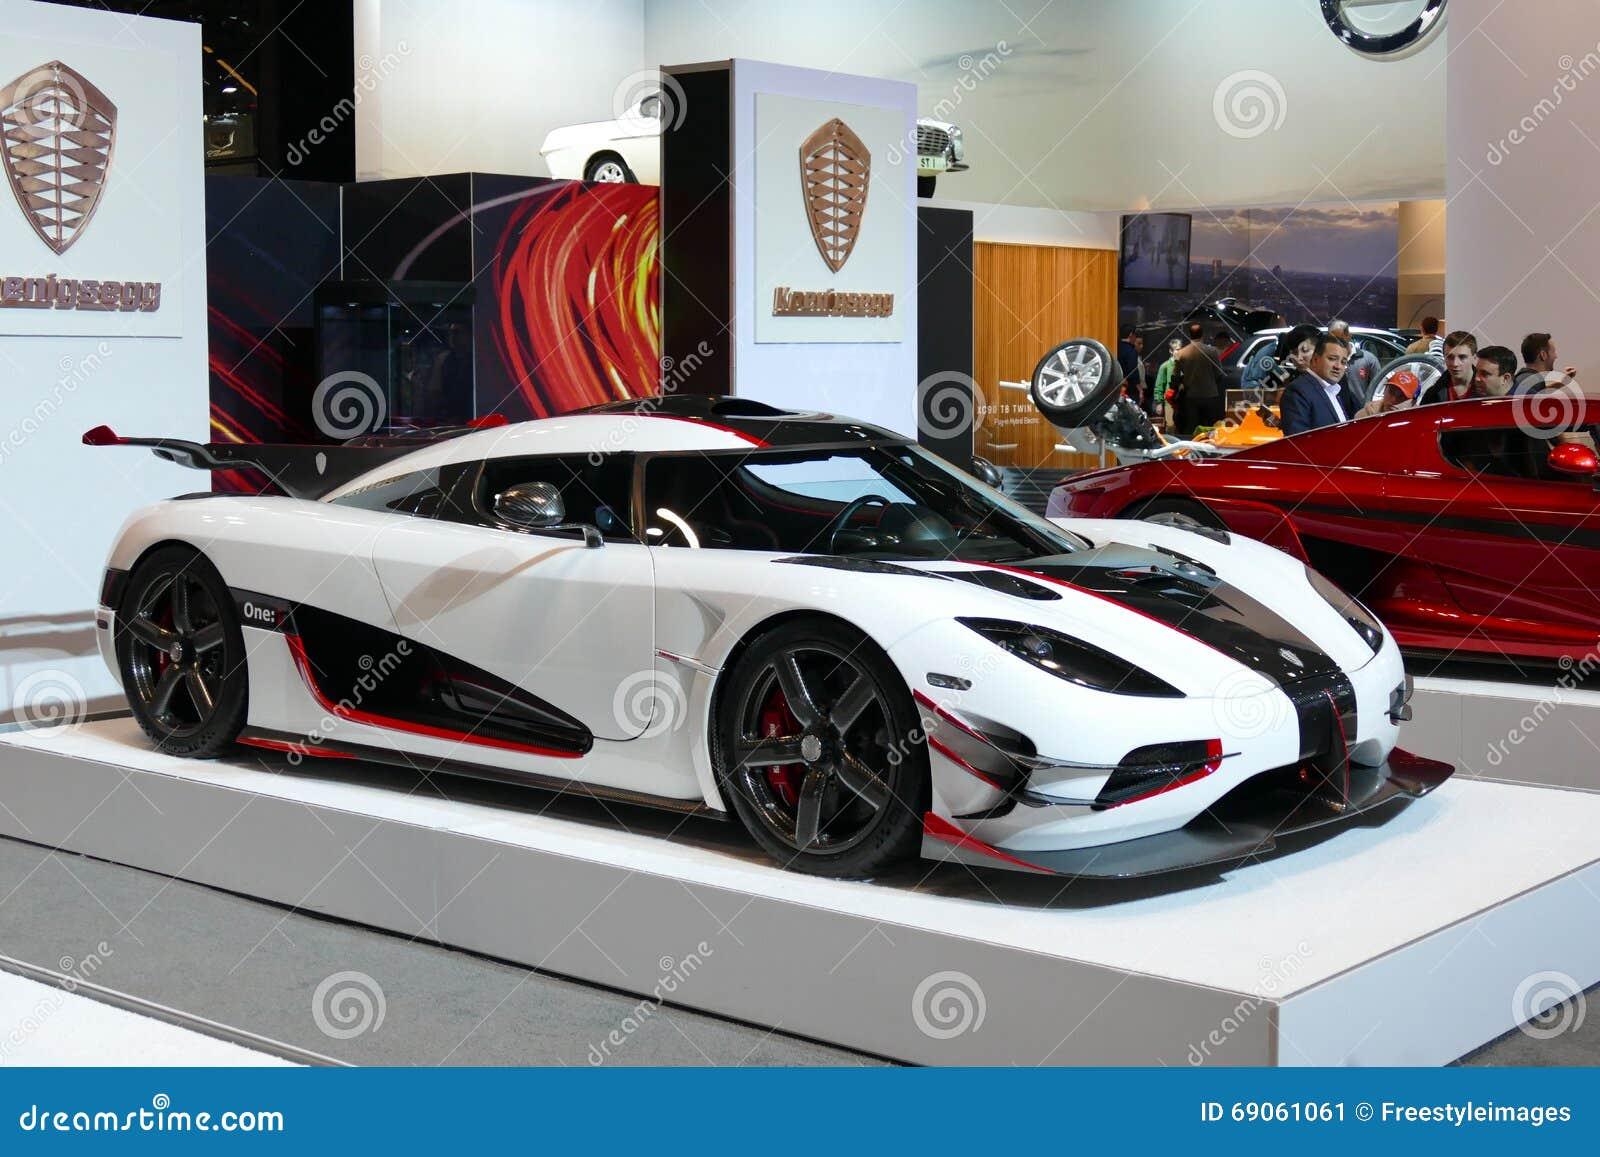 Koenigsegg One At New York International Auto ShowJPG Editorial - Nyc car show javits center